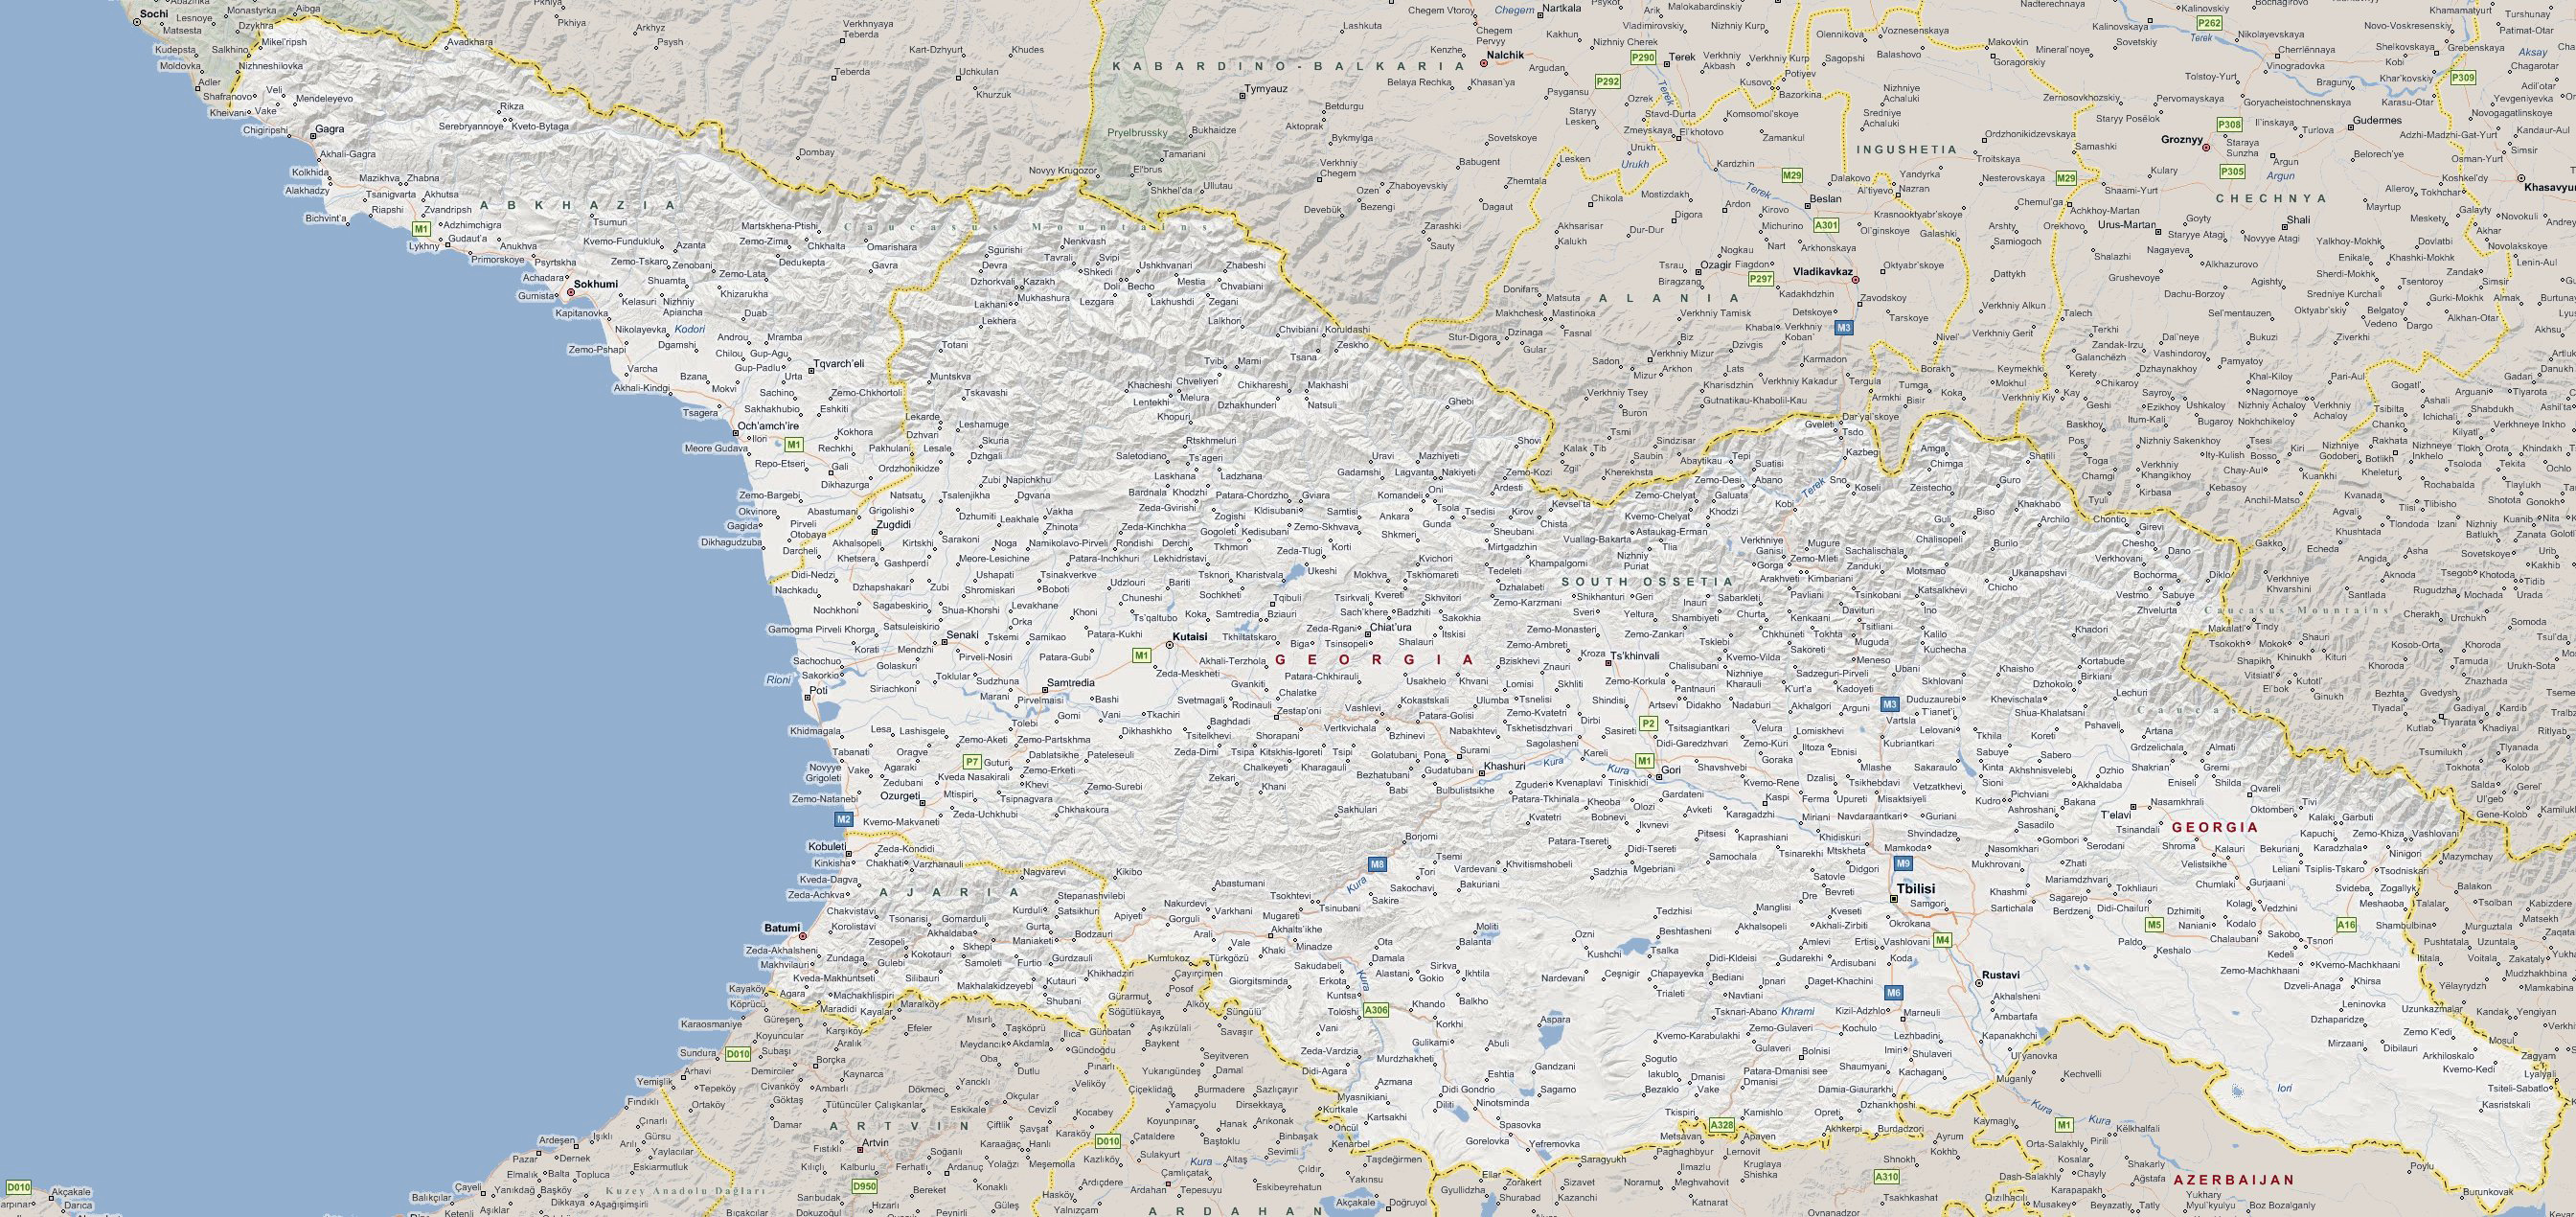 Maps Of Georgia Detailed Map Of Georgia In English Tourist Map - Large map of georgia